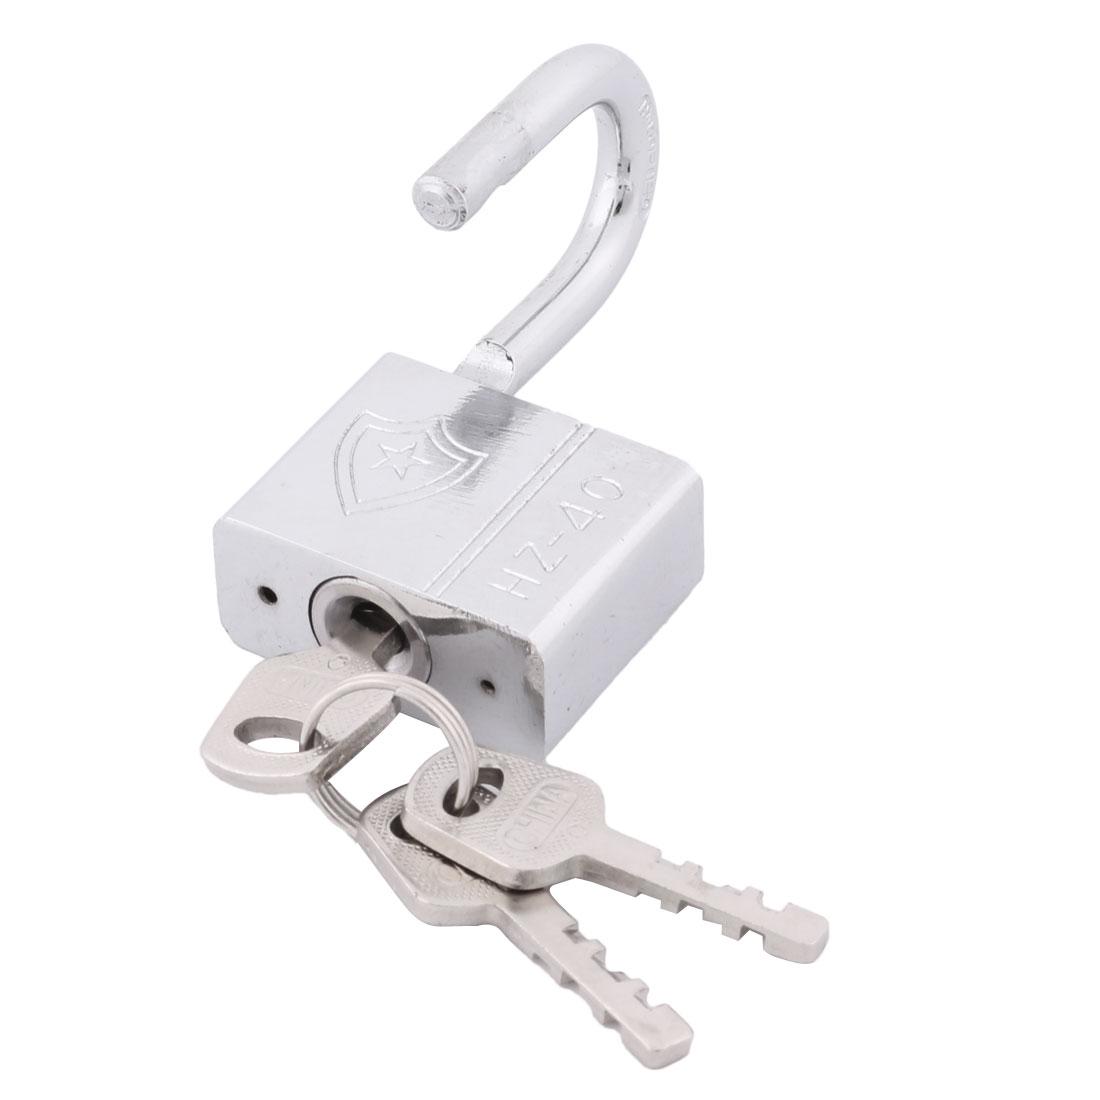 Door Metal Rectangle Security Shackle Padlock Hardware Silver Tone 40mm Width - image 2 of 3